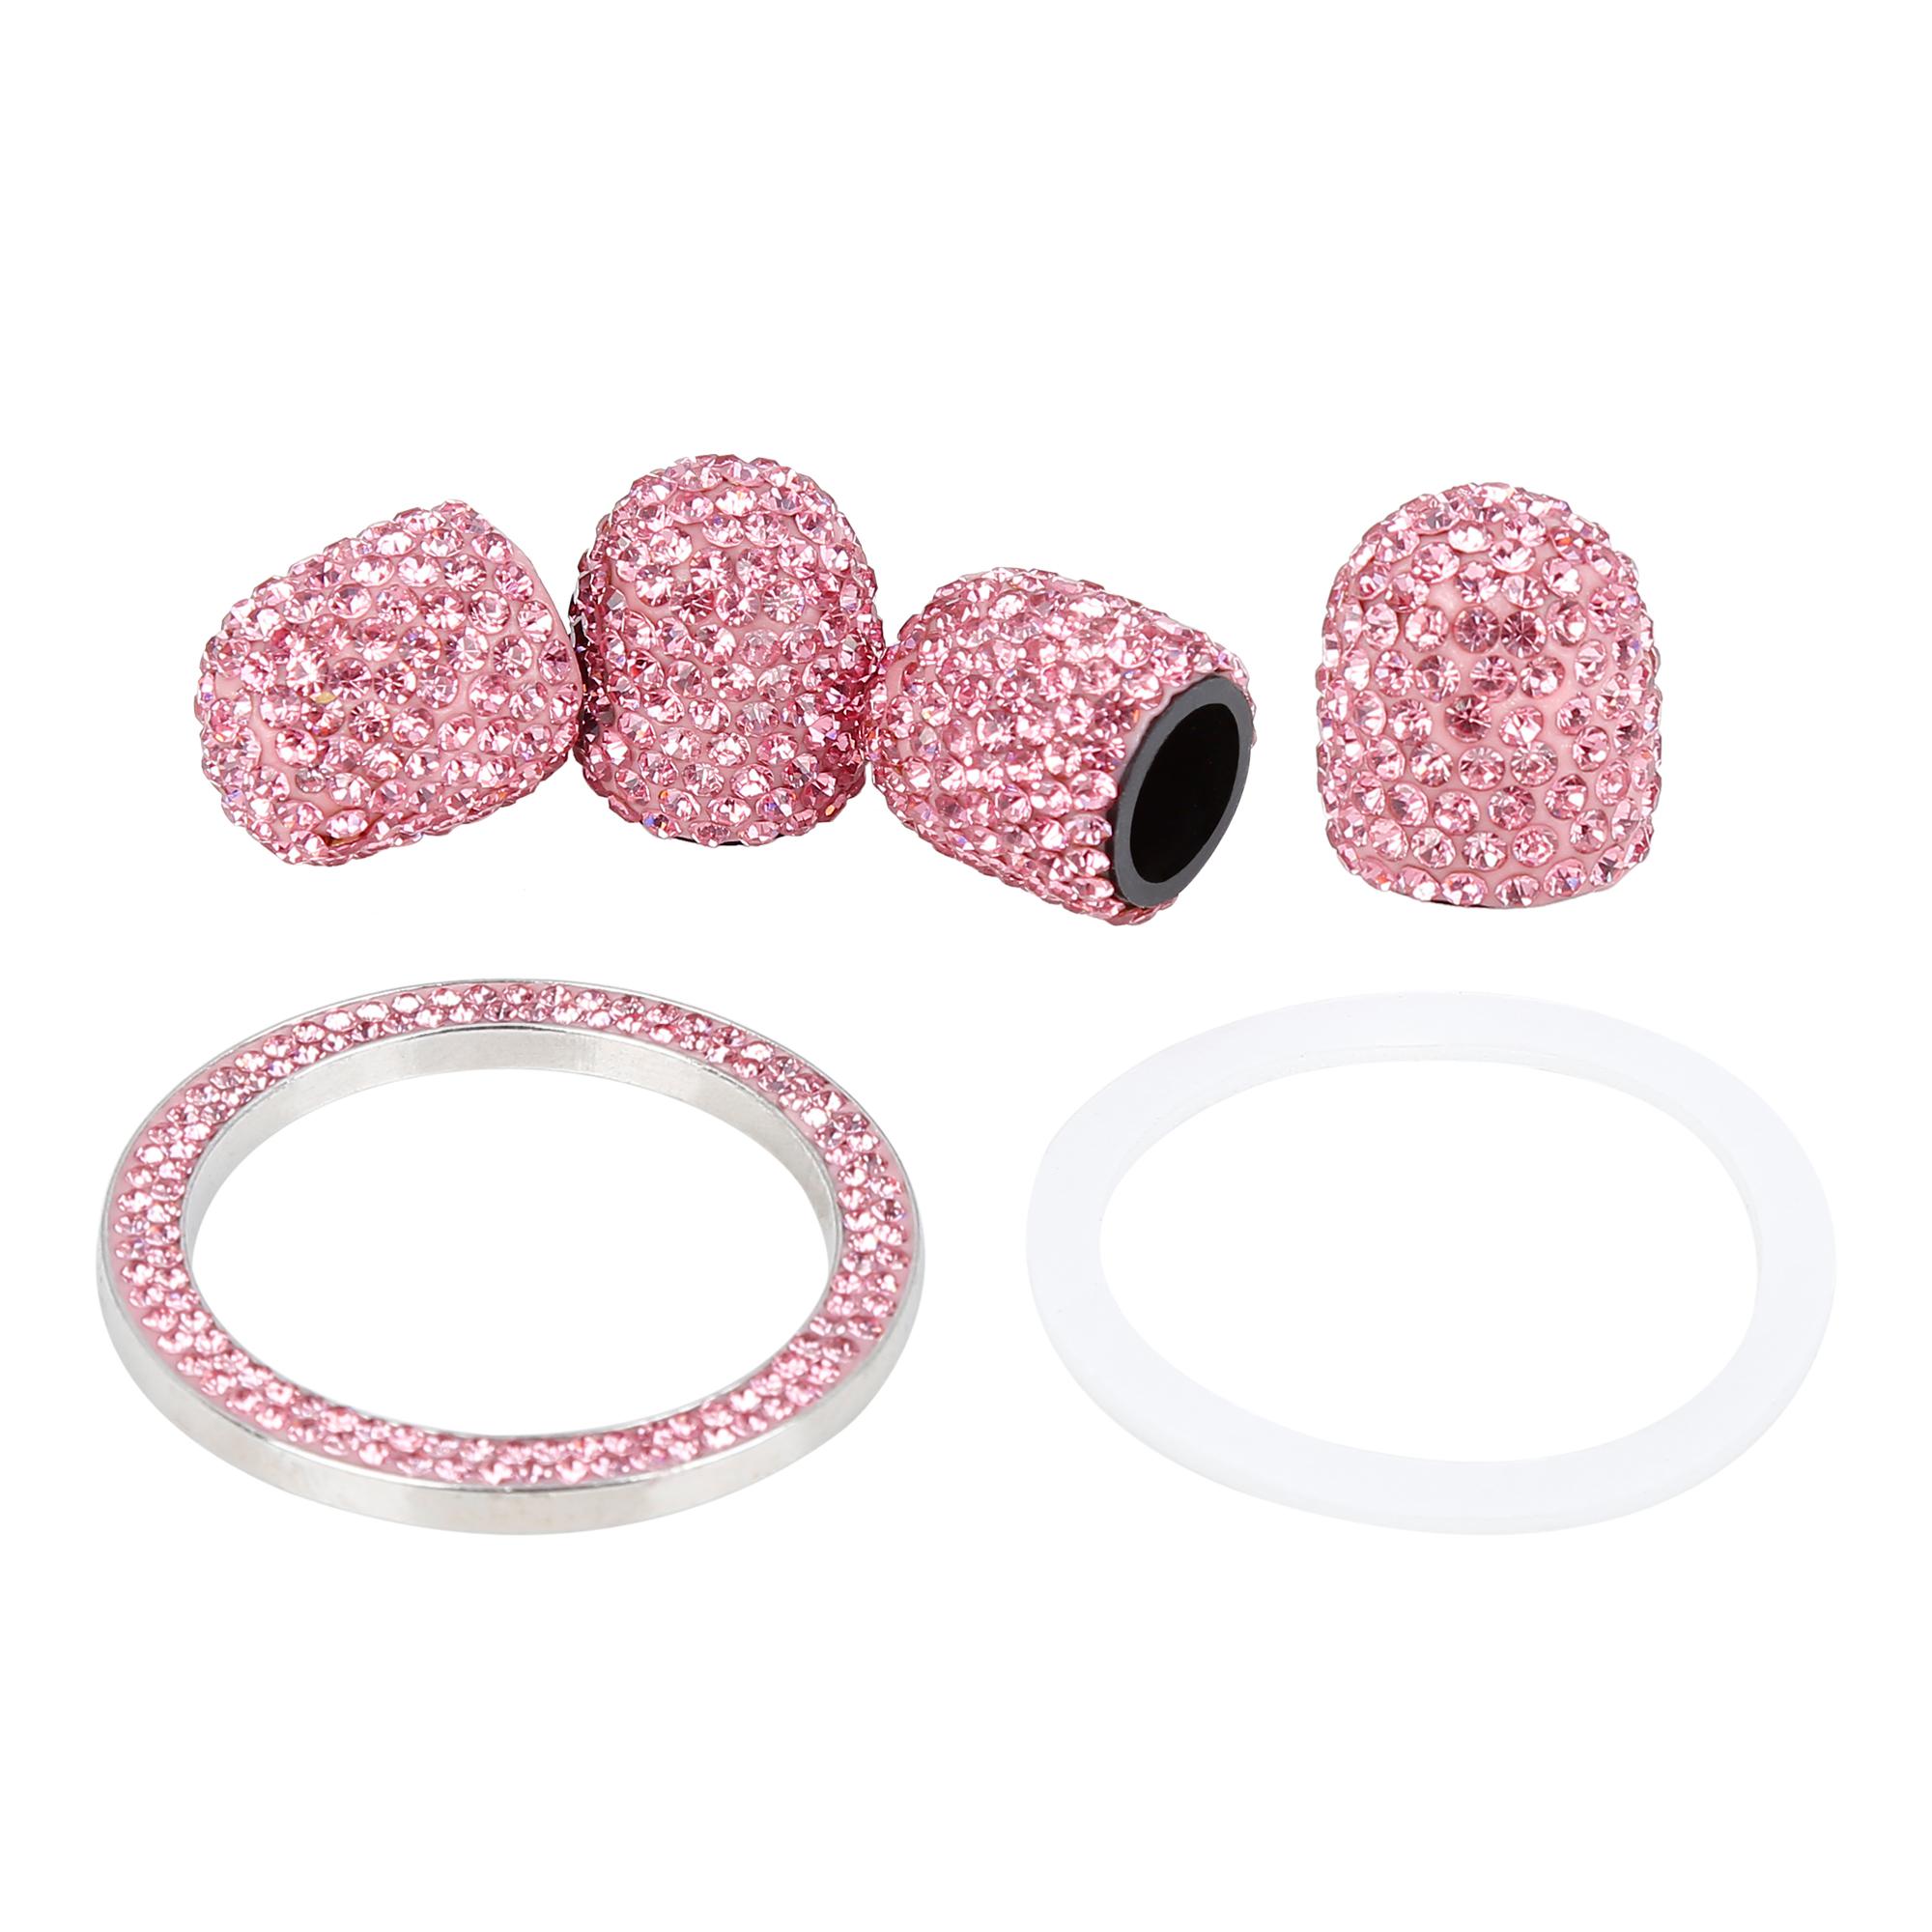 4PCS Bling Tire Valve Stem Caps Tyre Air Cap Cover + Ring Emblem Pink